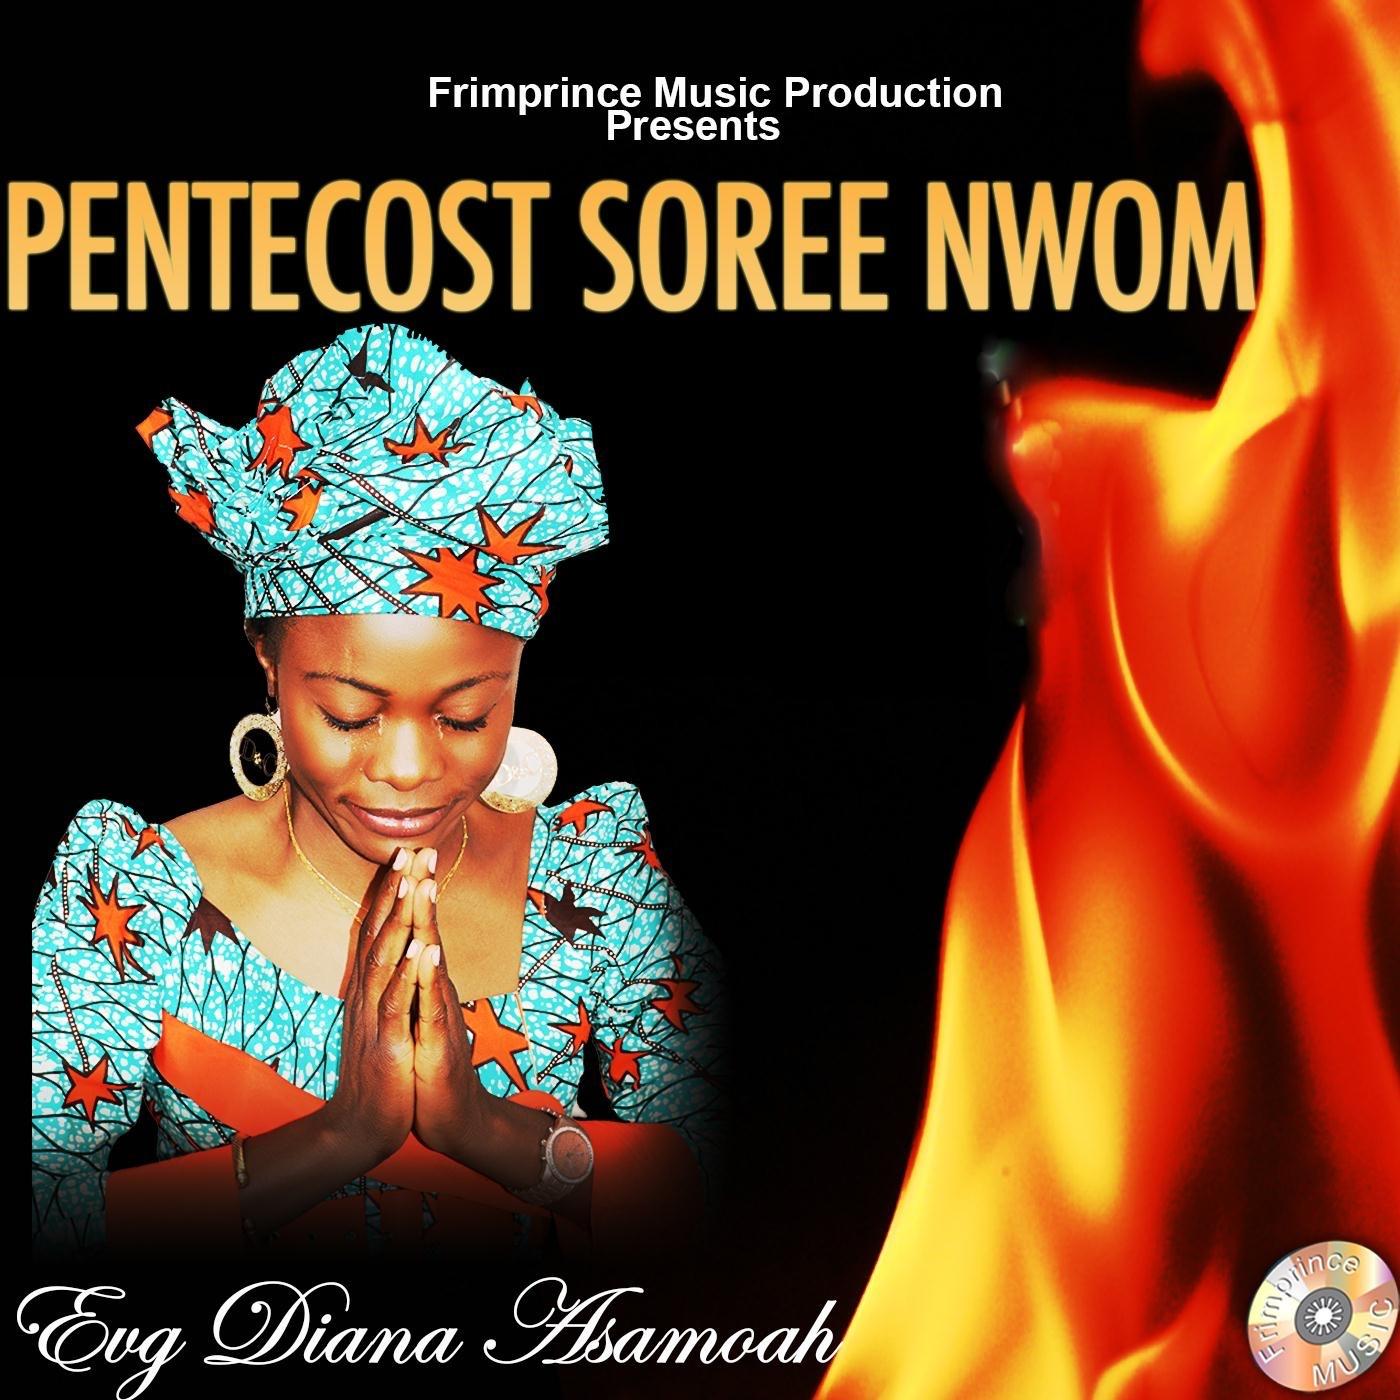 Pentecost Soree Nwom